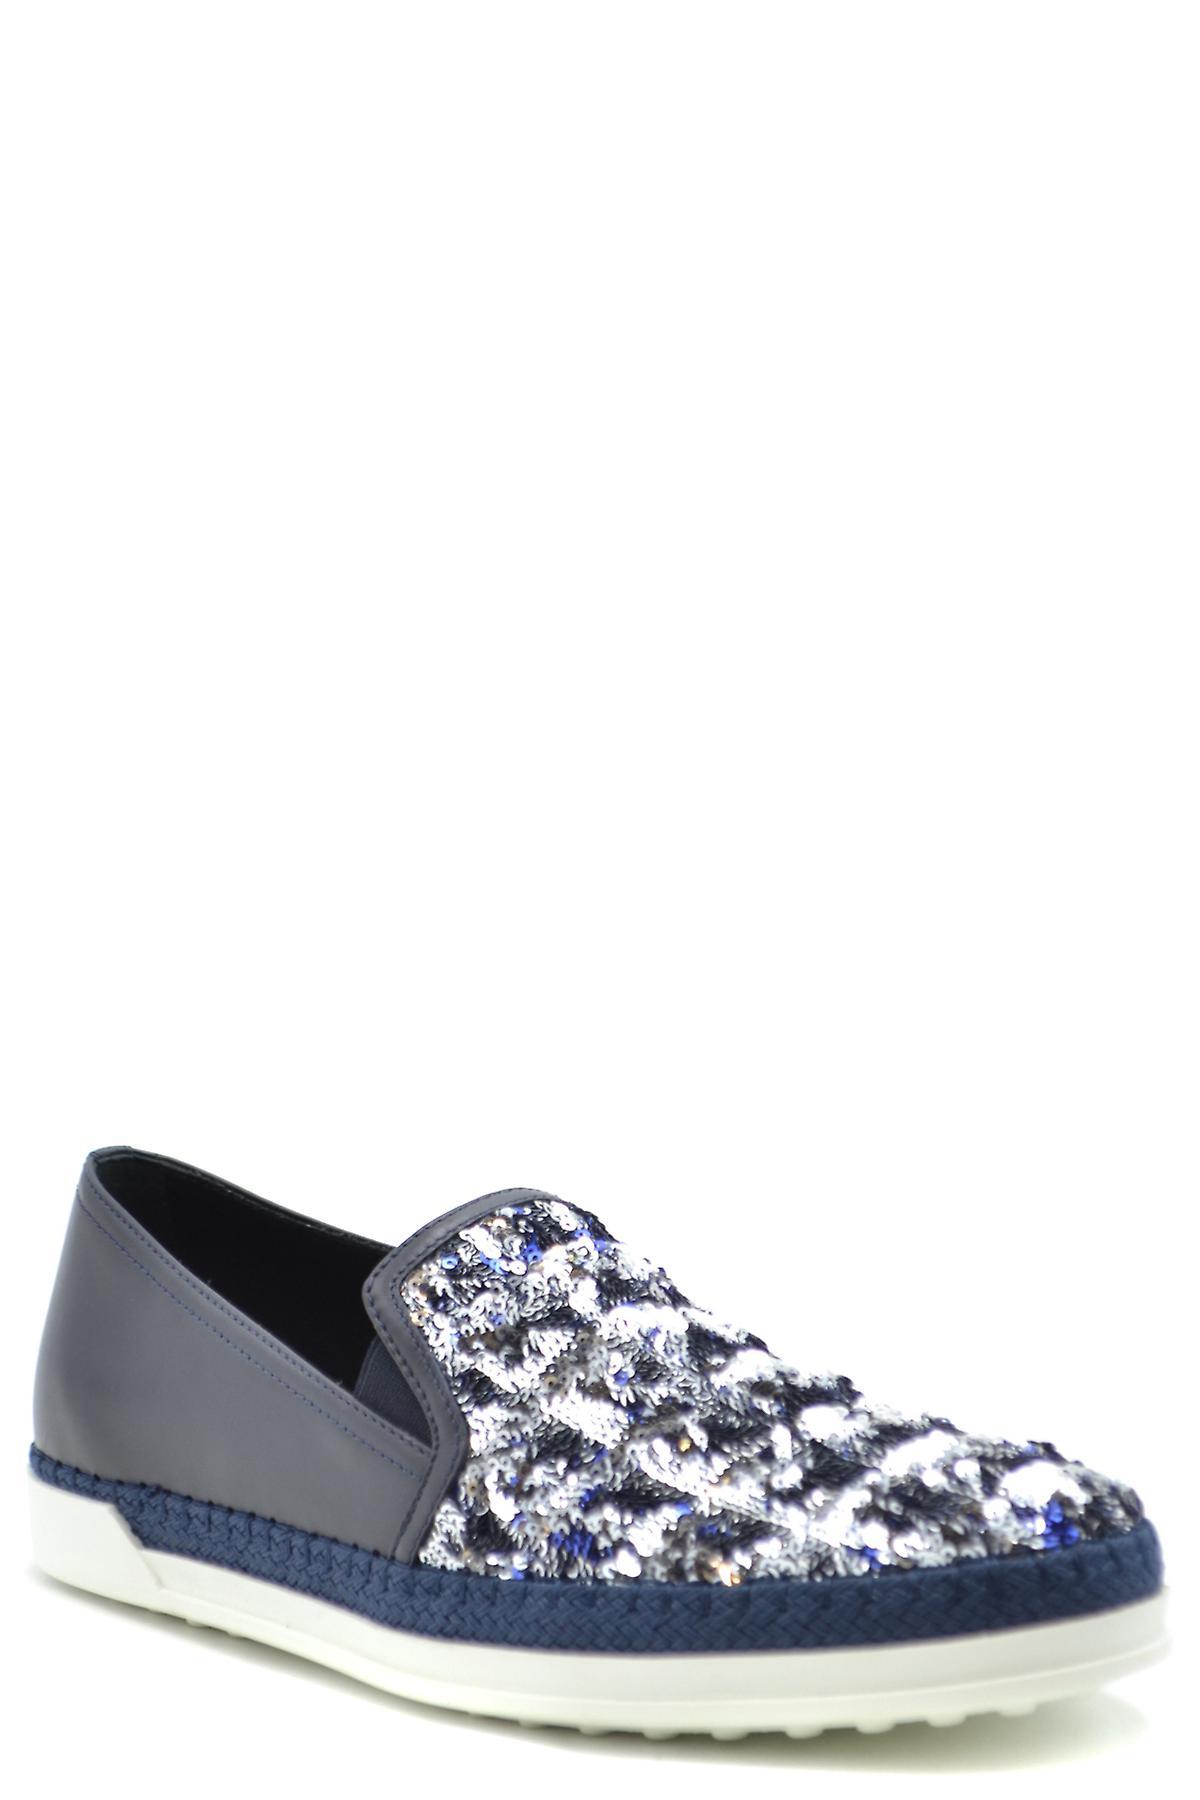 Tod's Ezbc025073 Dames's Blue Leather Loafers CncjJk